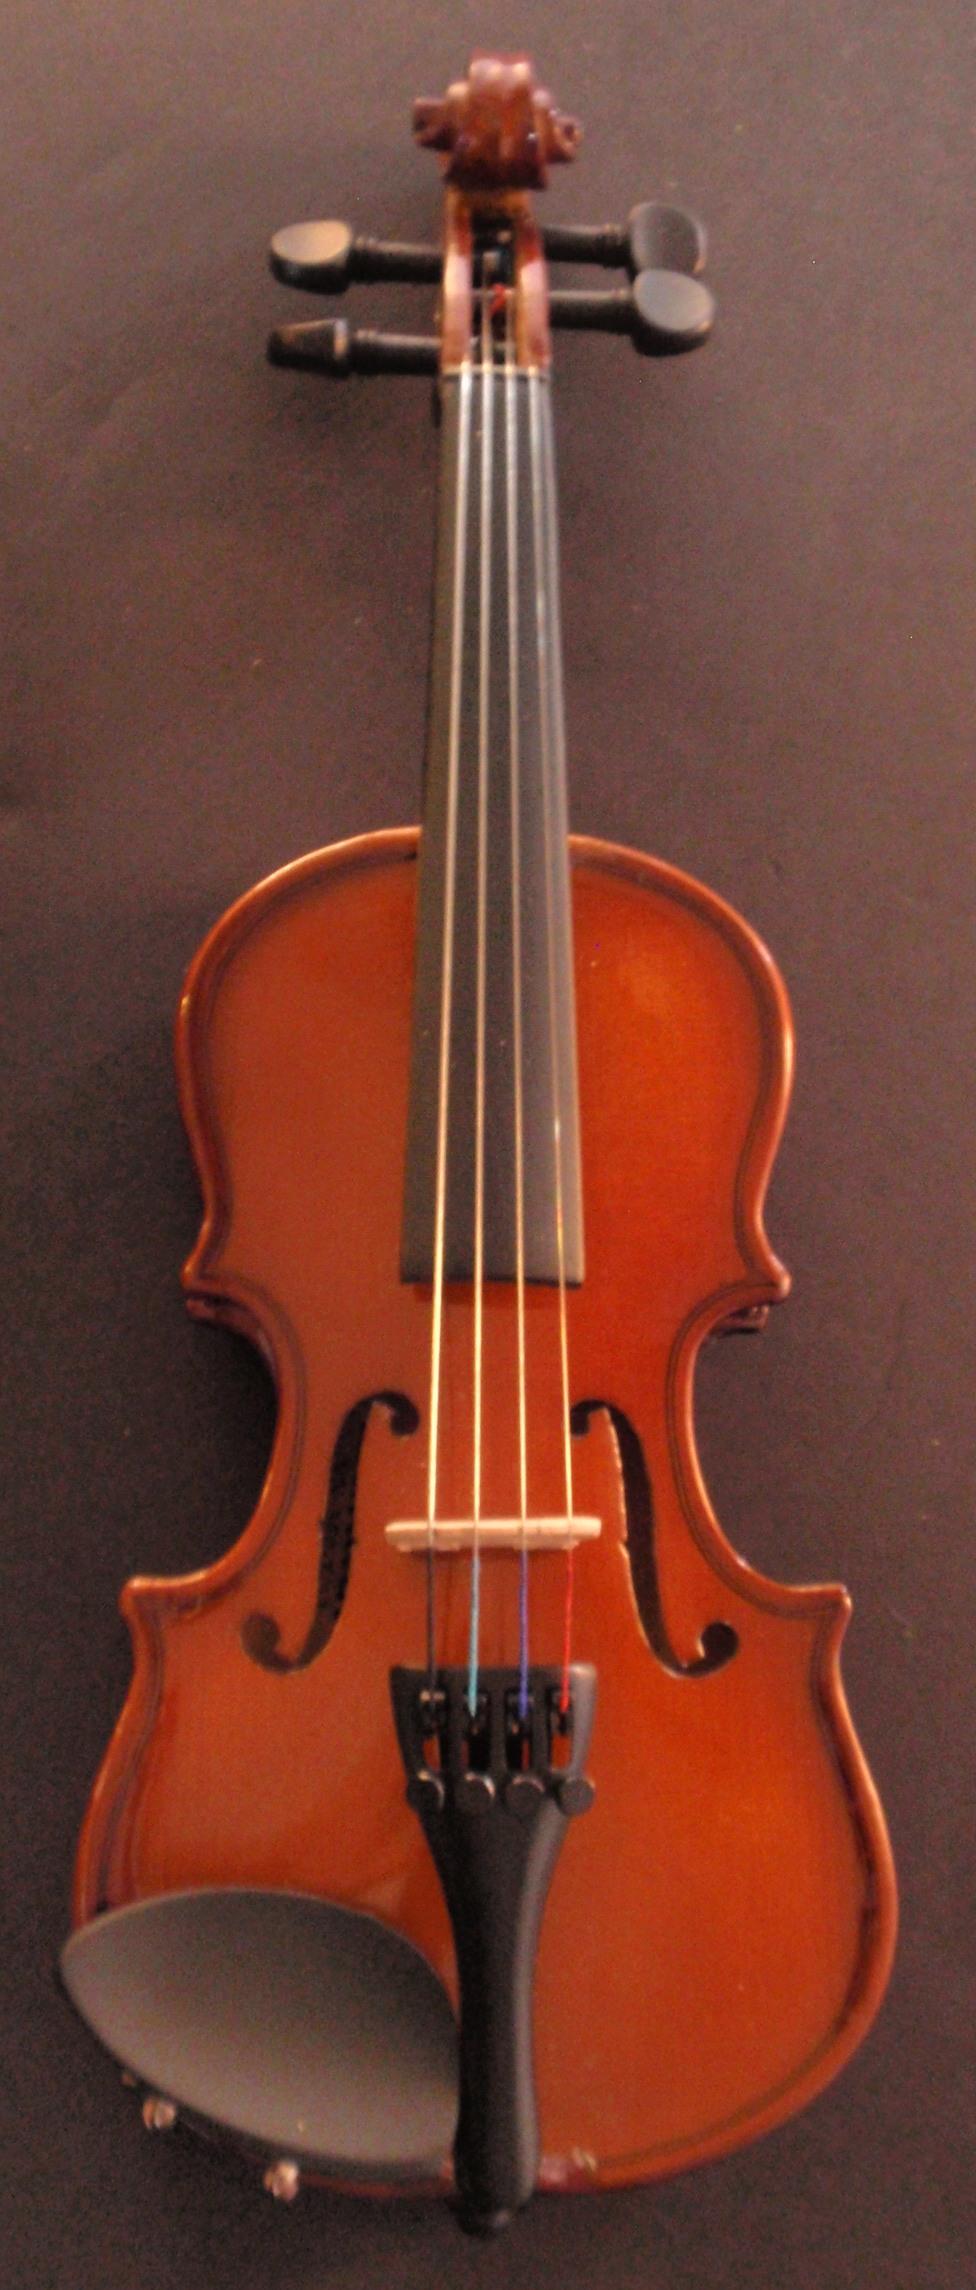 Campus Violin Frontview